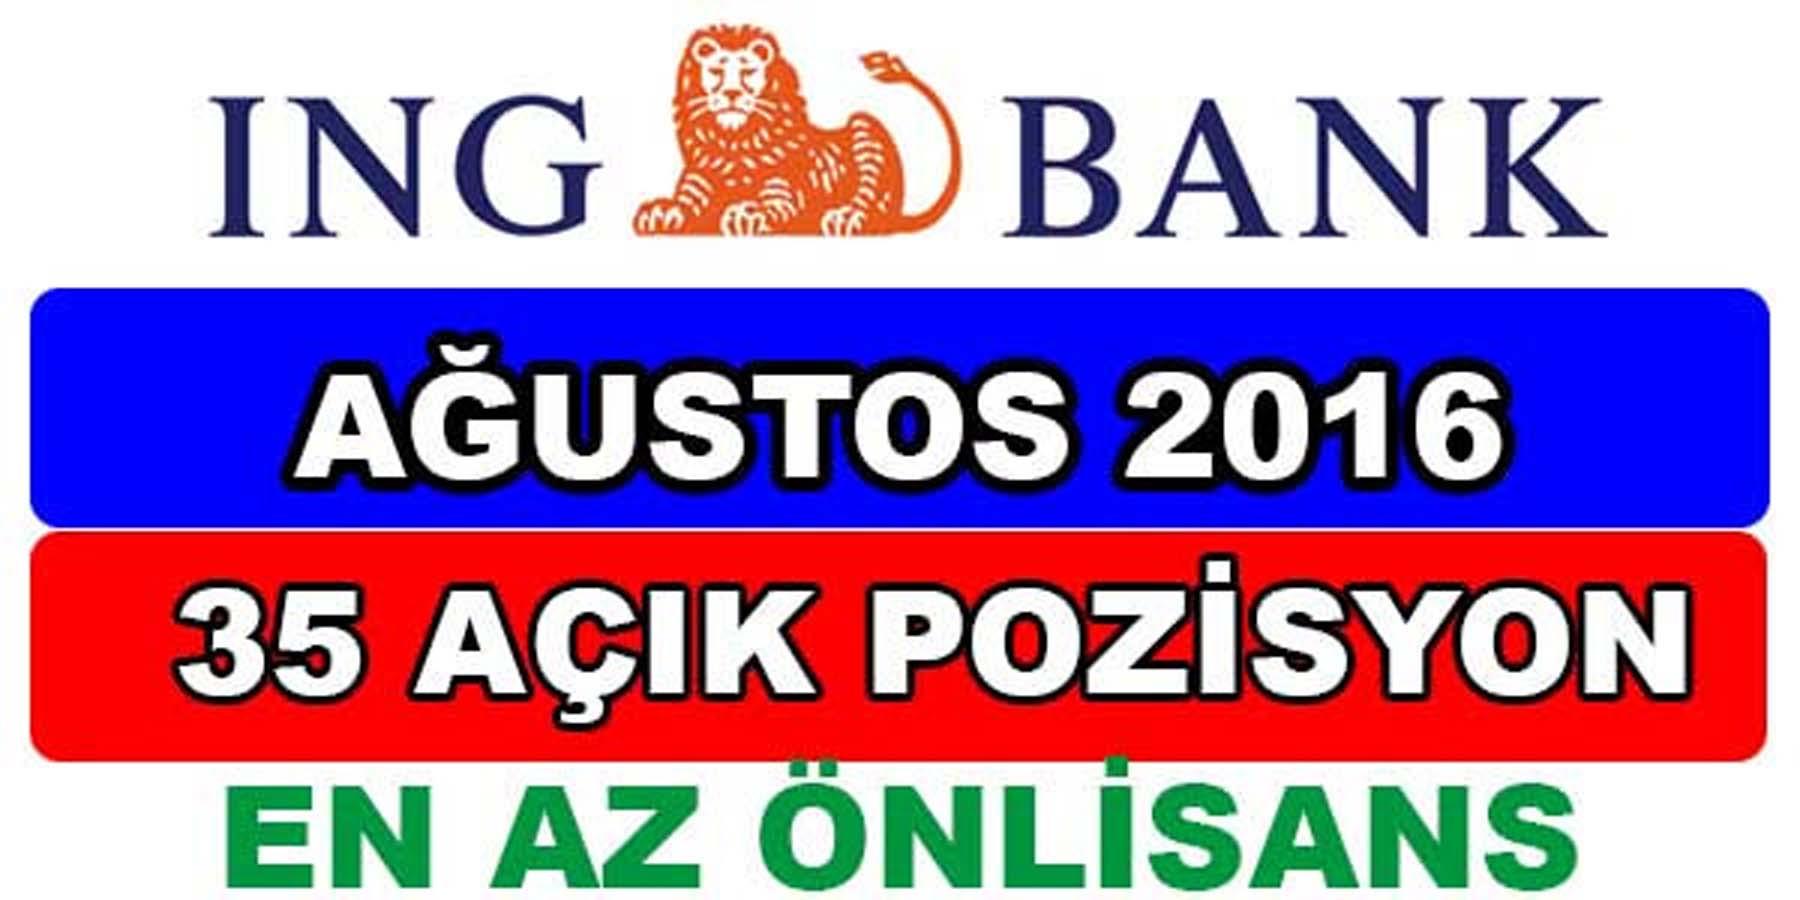 ING Bank Ağustos 2016 Personel Alımı